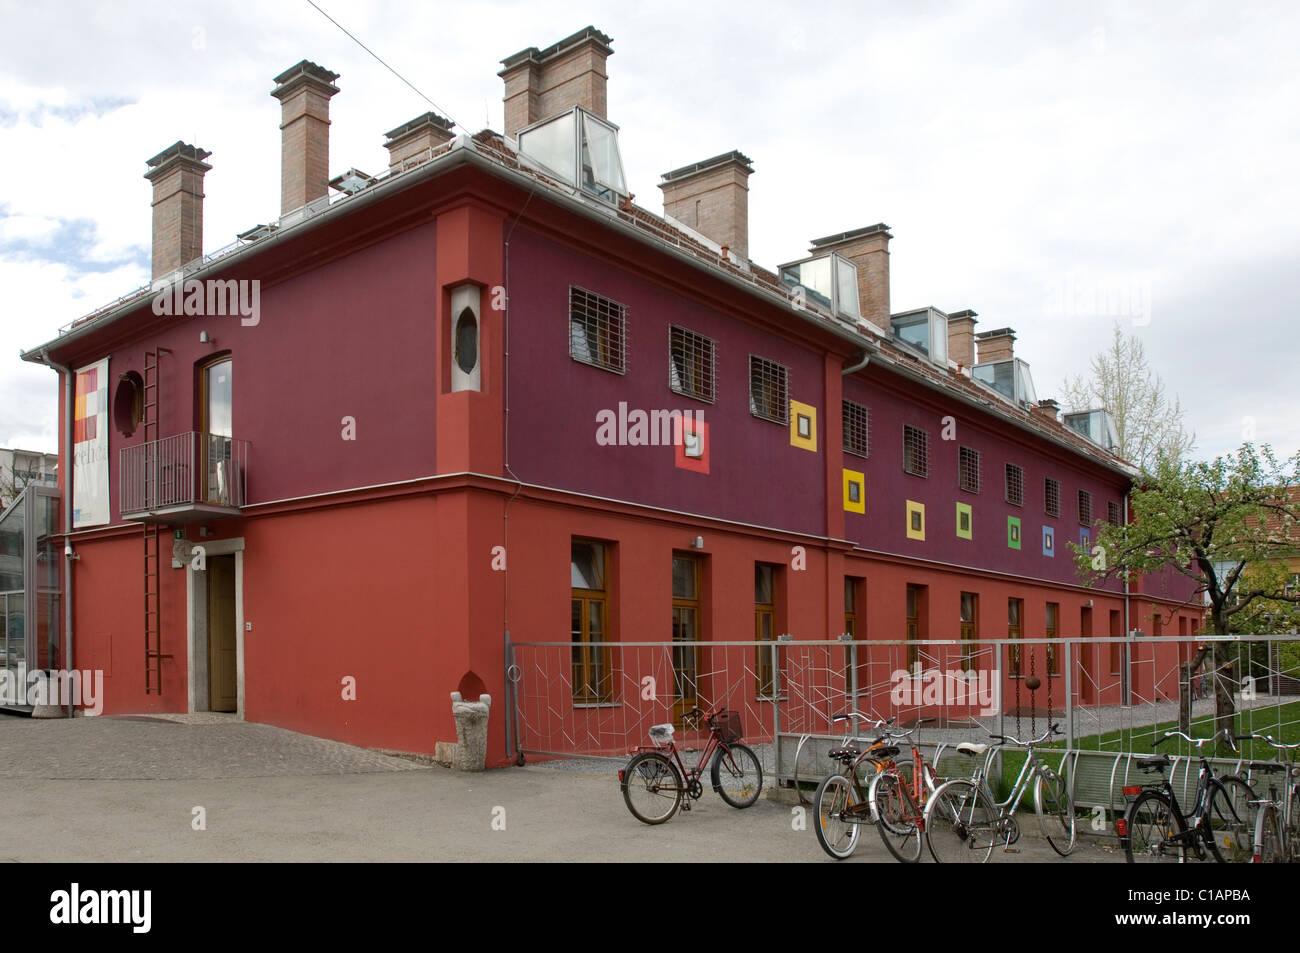 Celica, the old prison now youth hostel, Ljubljana, Slovenia, Europe Stock Photo